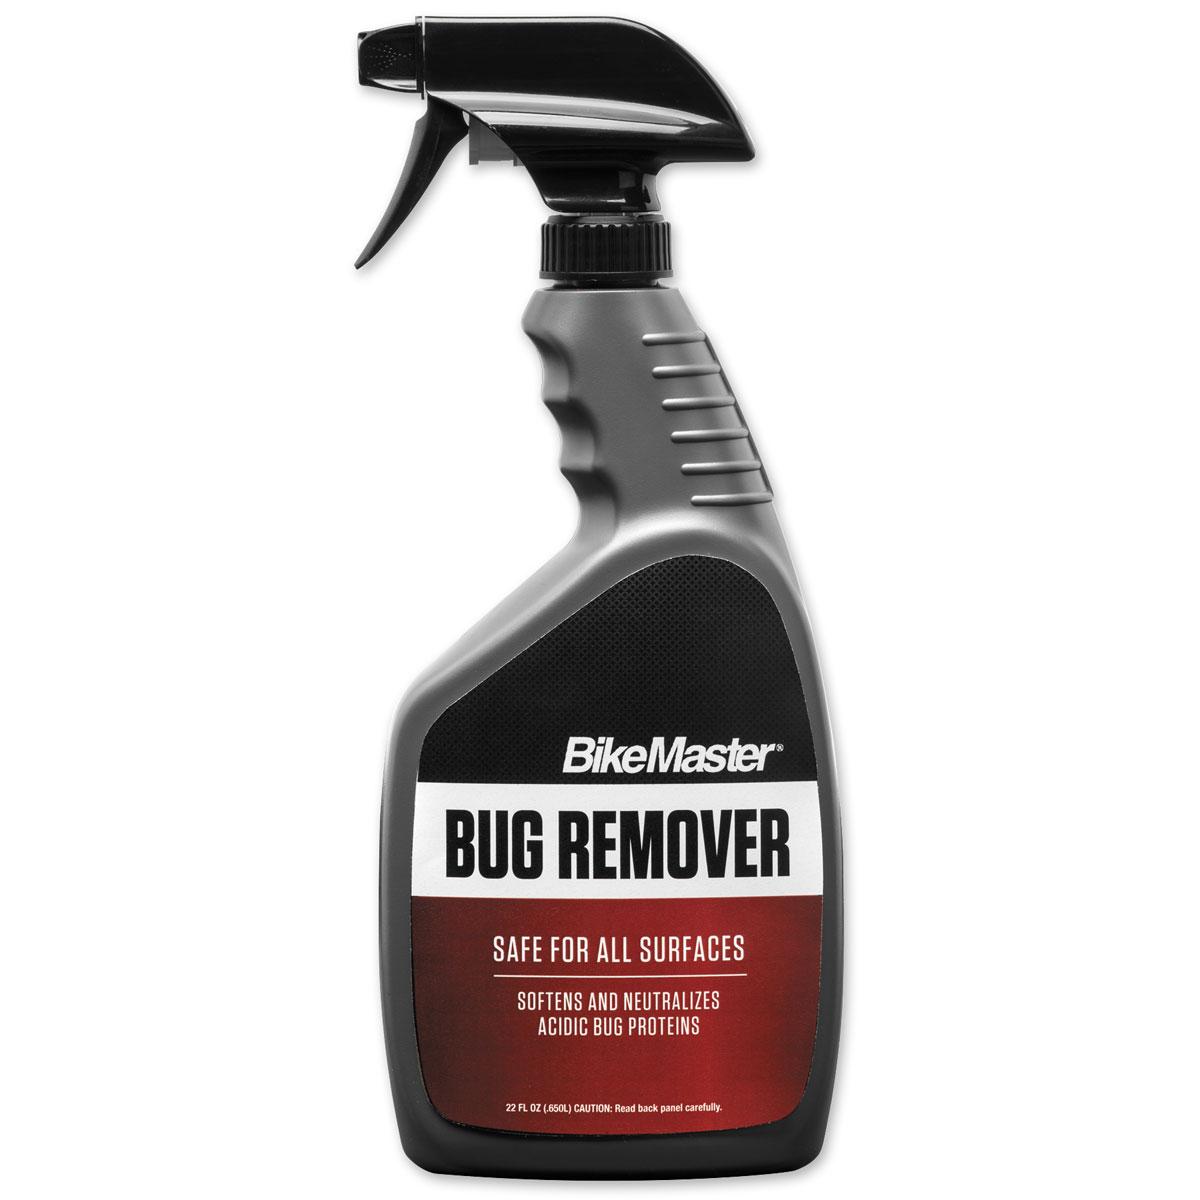 BikeMaster Bug Remover